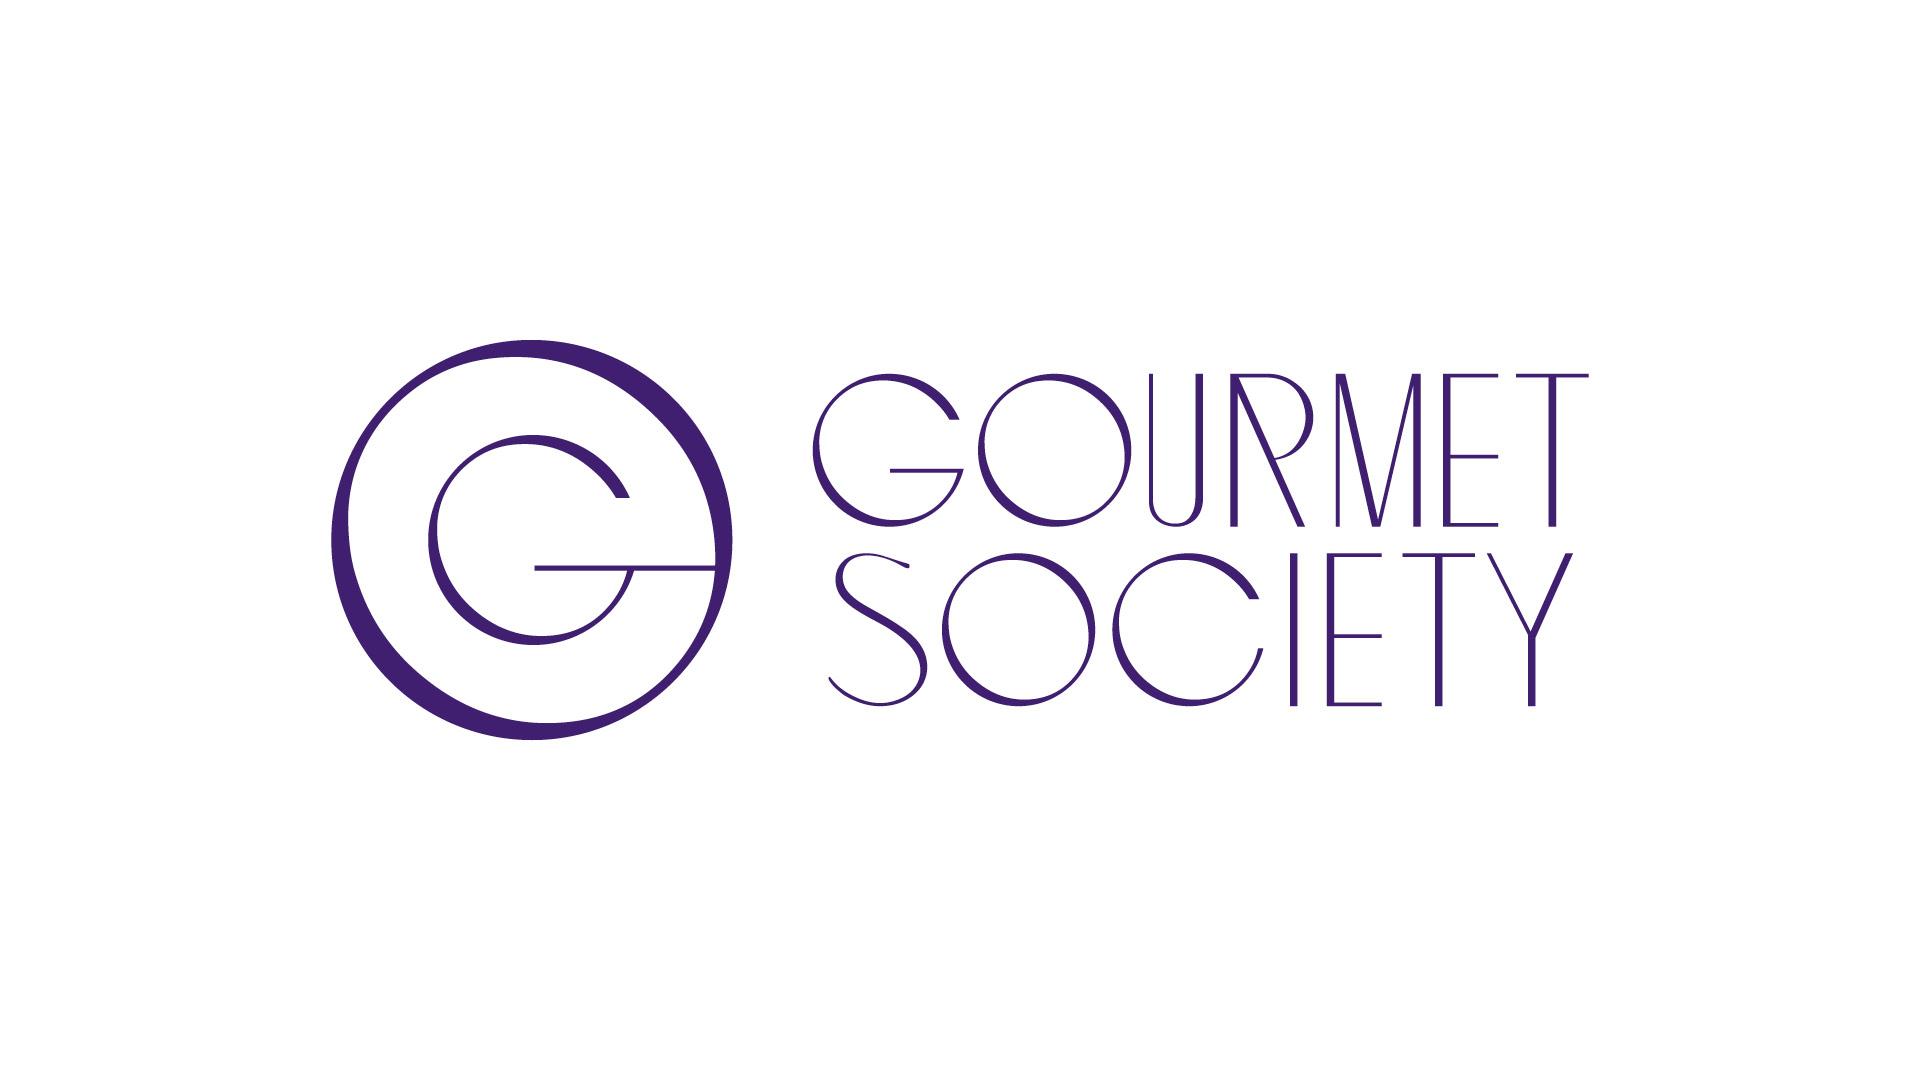 GourmetSociety-Work-By-YaStudio-12